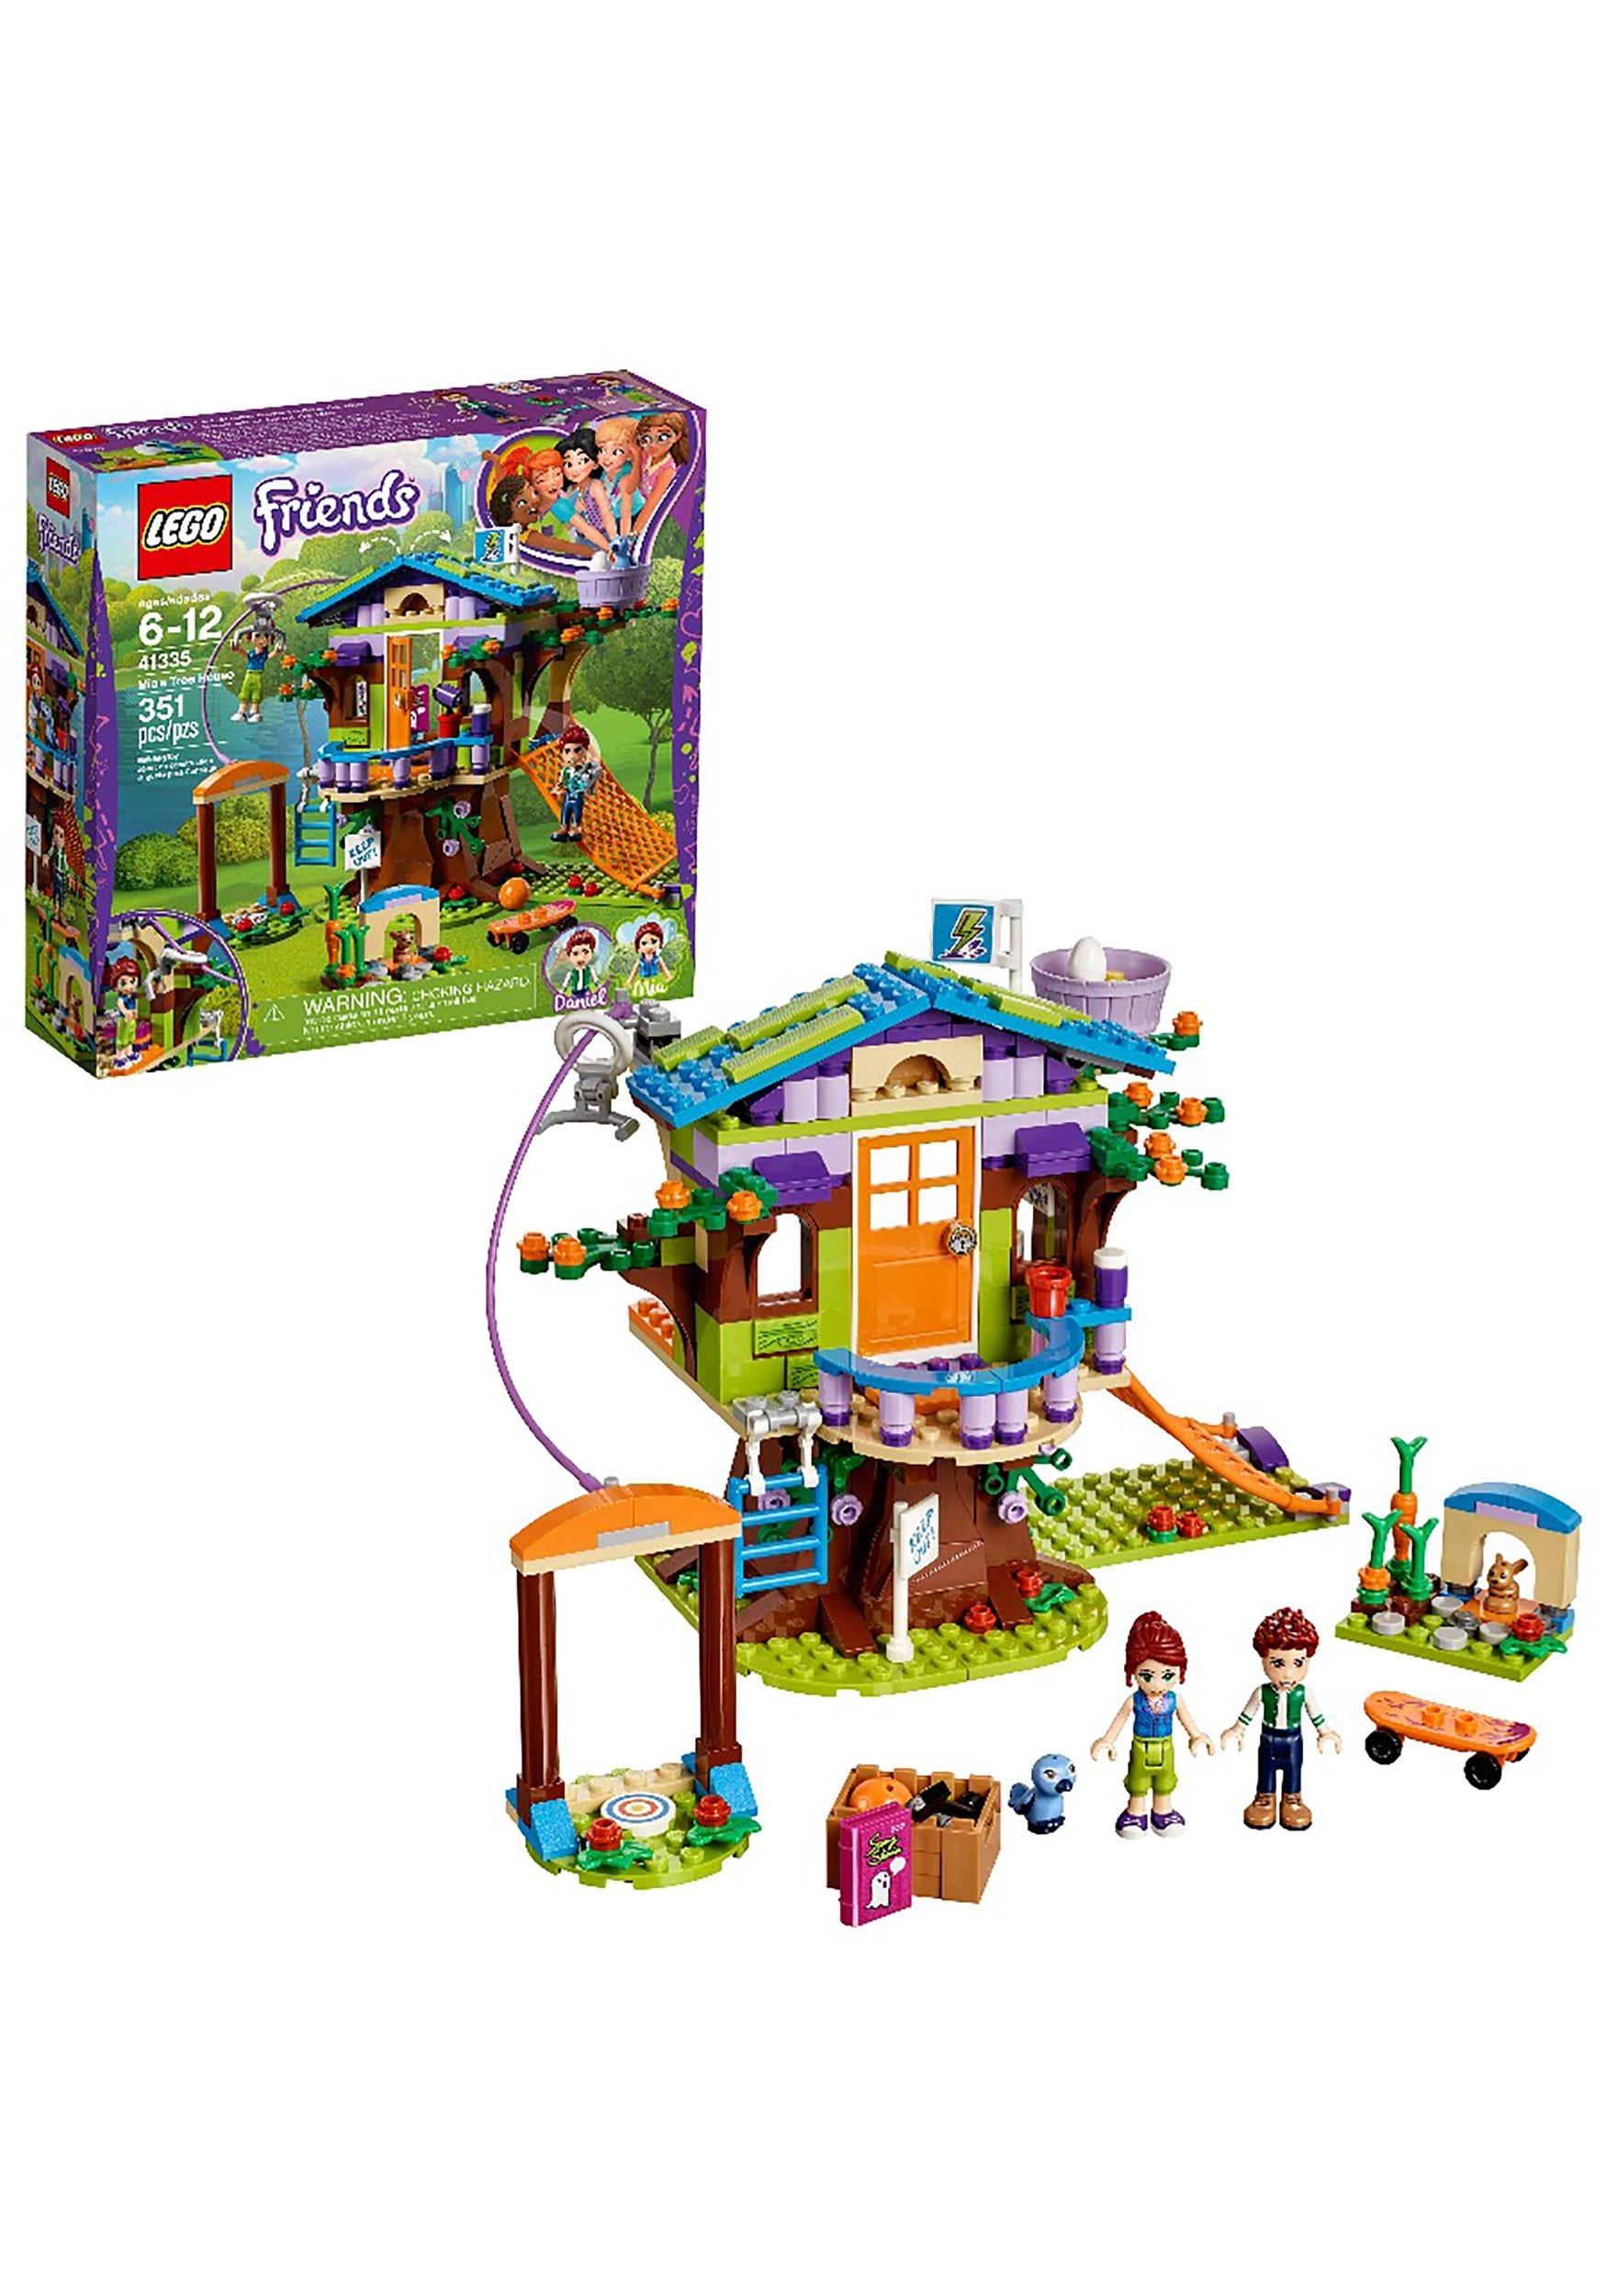 Lego Friends 351pc Mia S Tree House